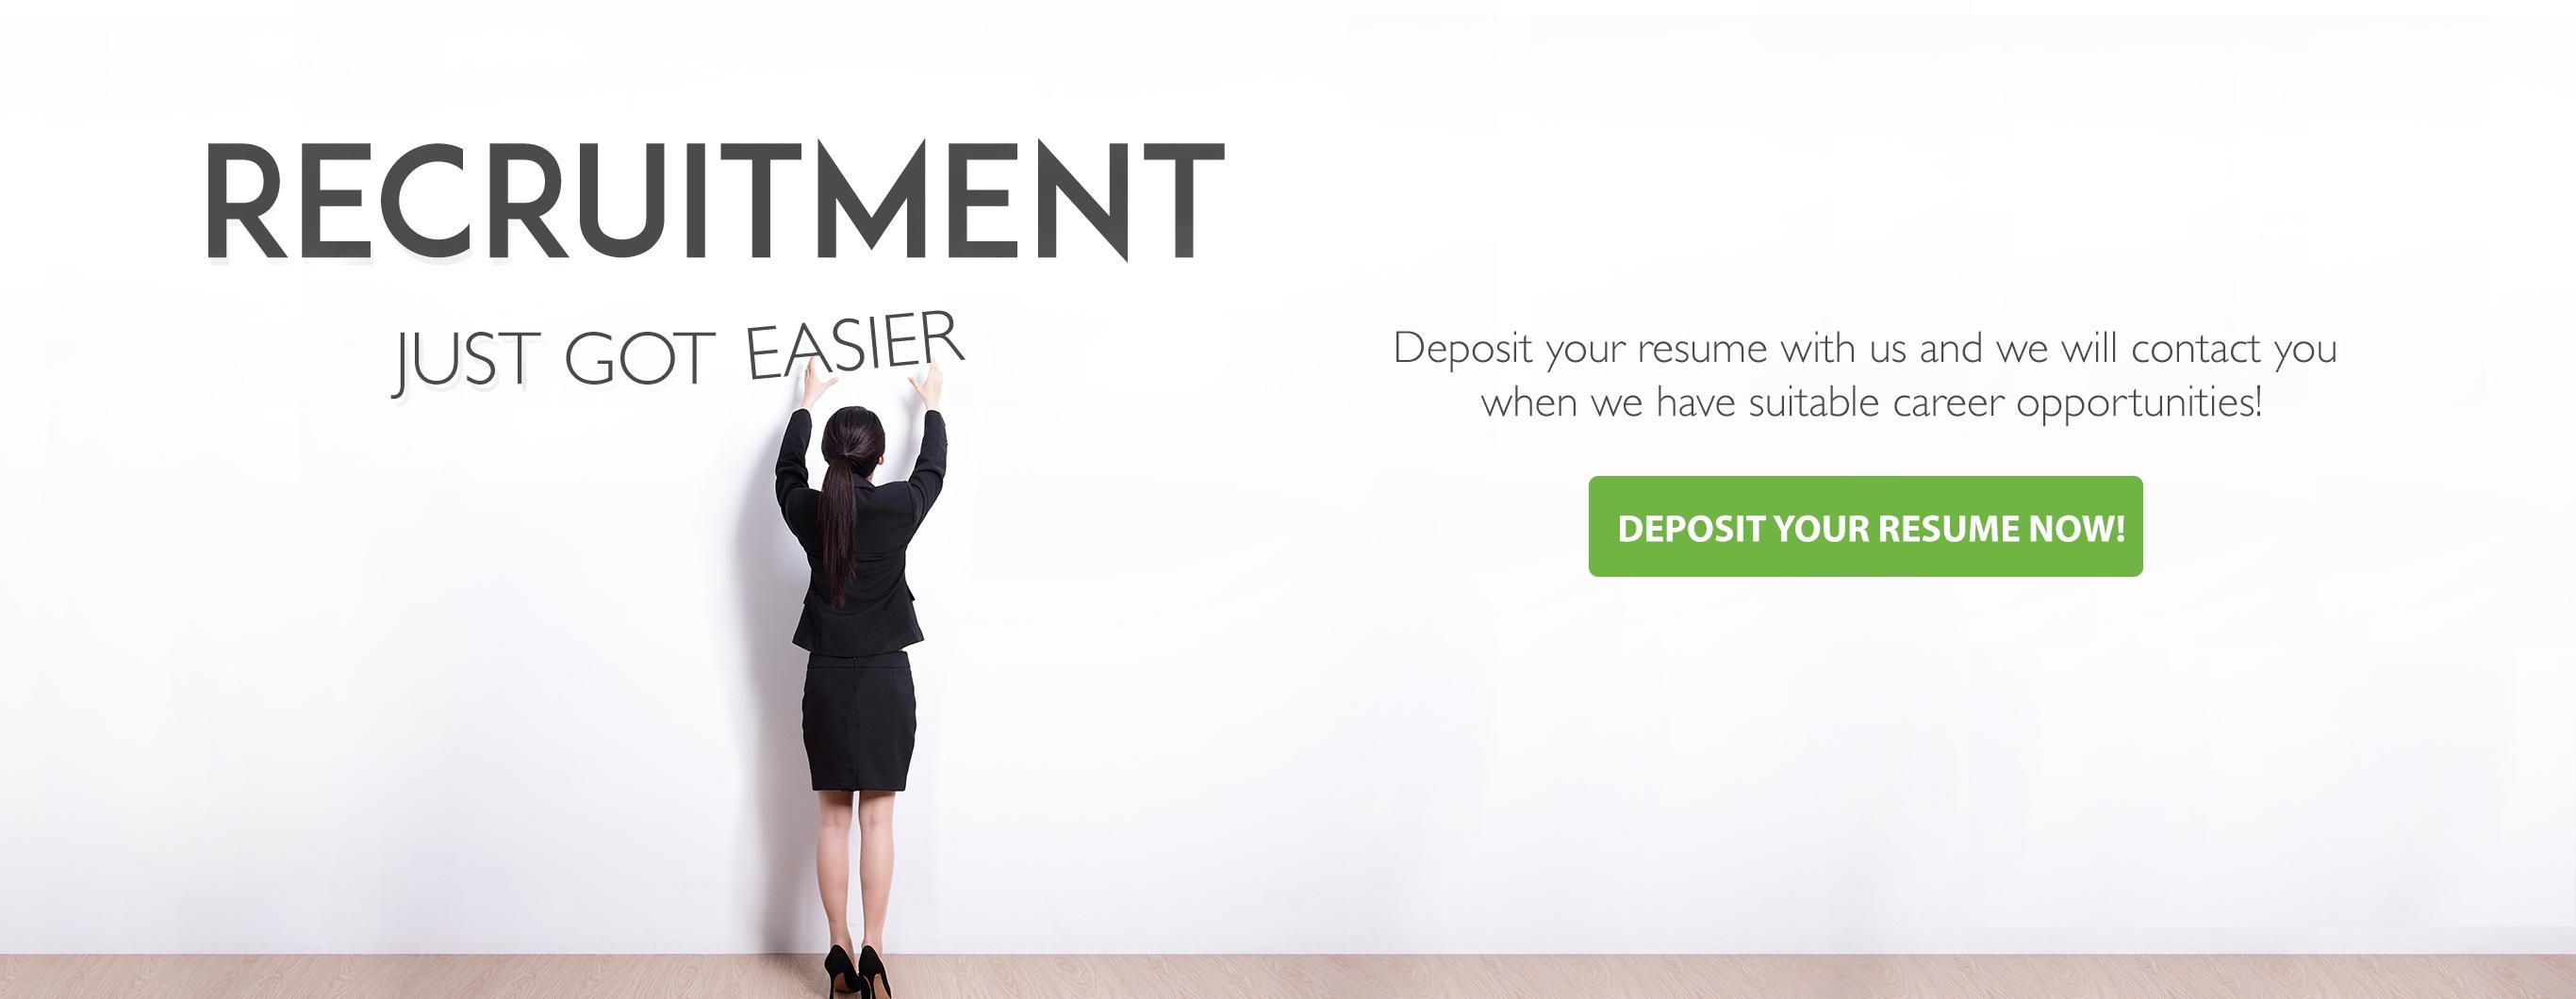 recruitmentjustgoteasier